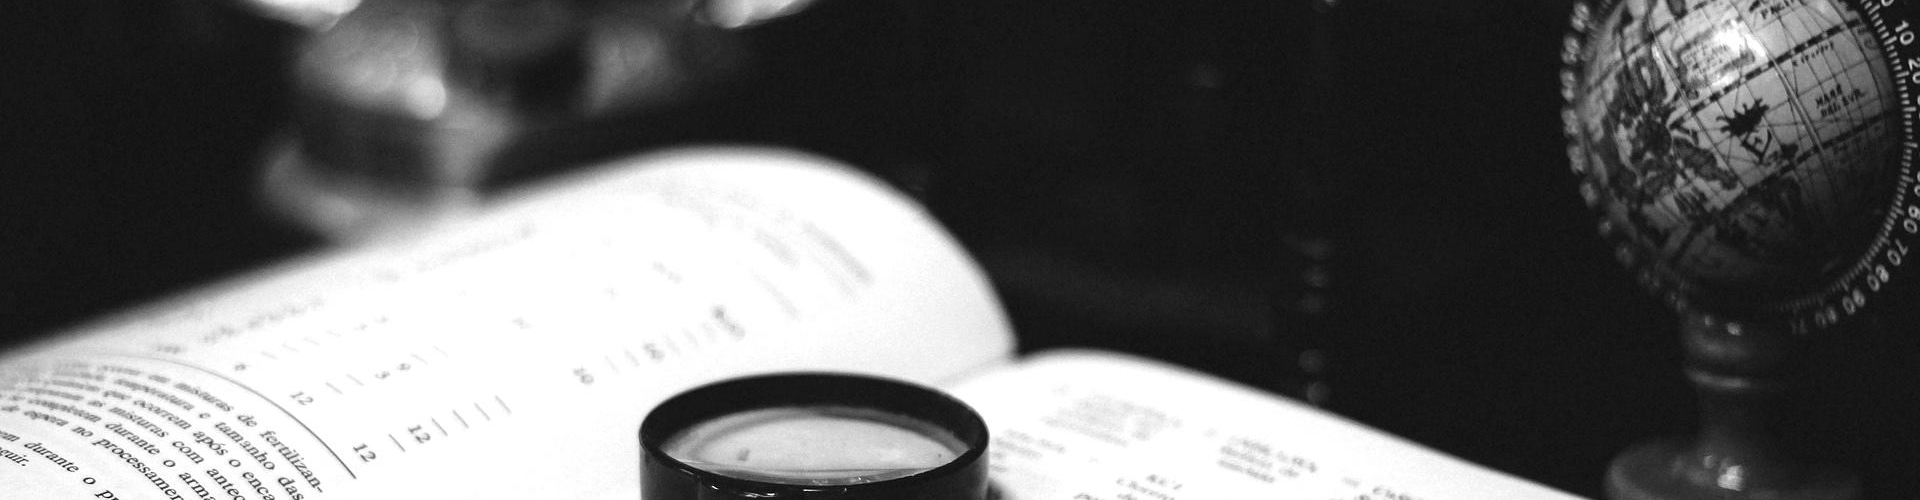 ocenka_predmetov_iskusstva-blackwhite